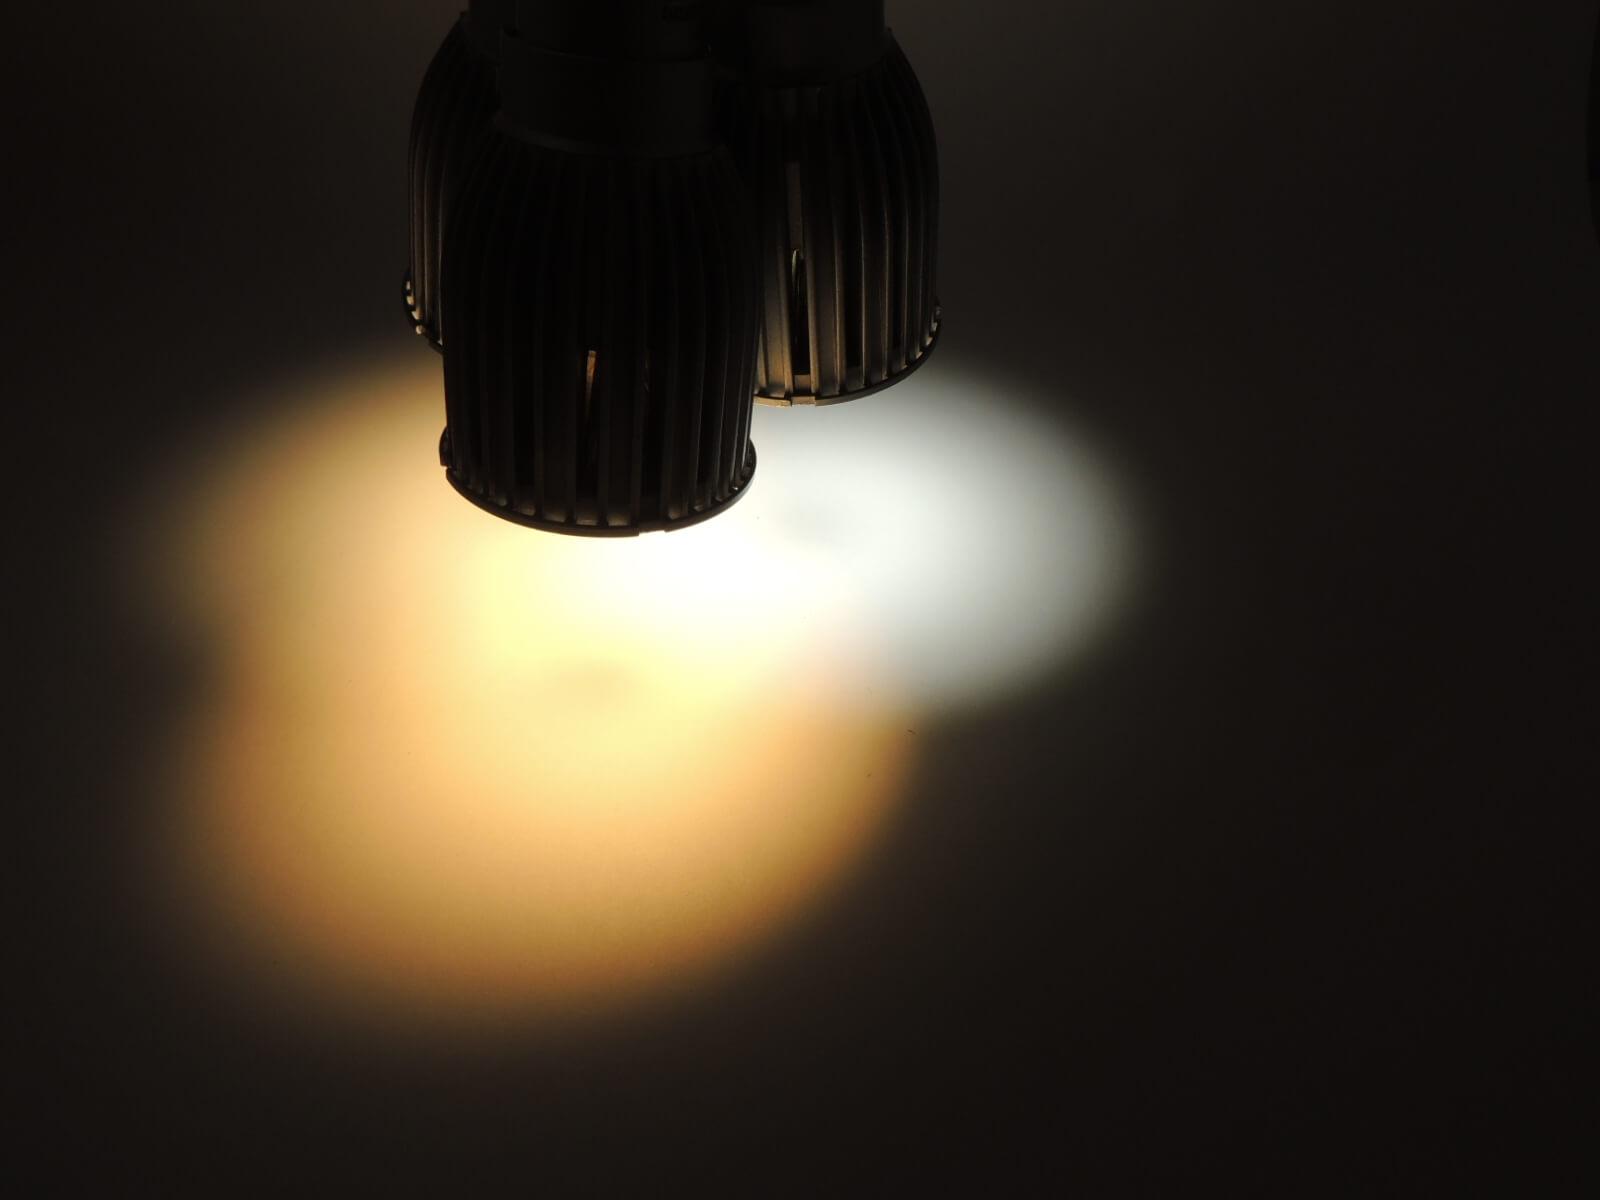 Luz led c lida fr a o neutra ilumina seg n el ambiente - Luces led calidas ...